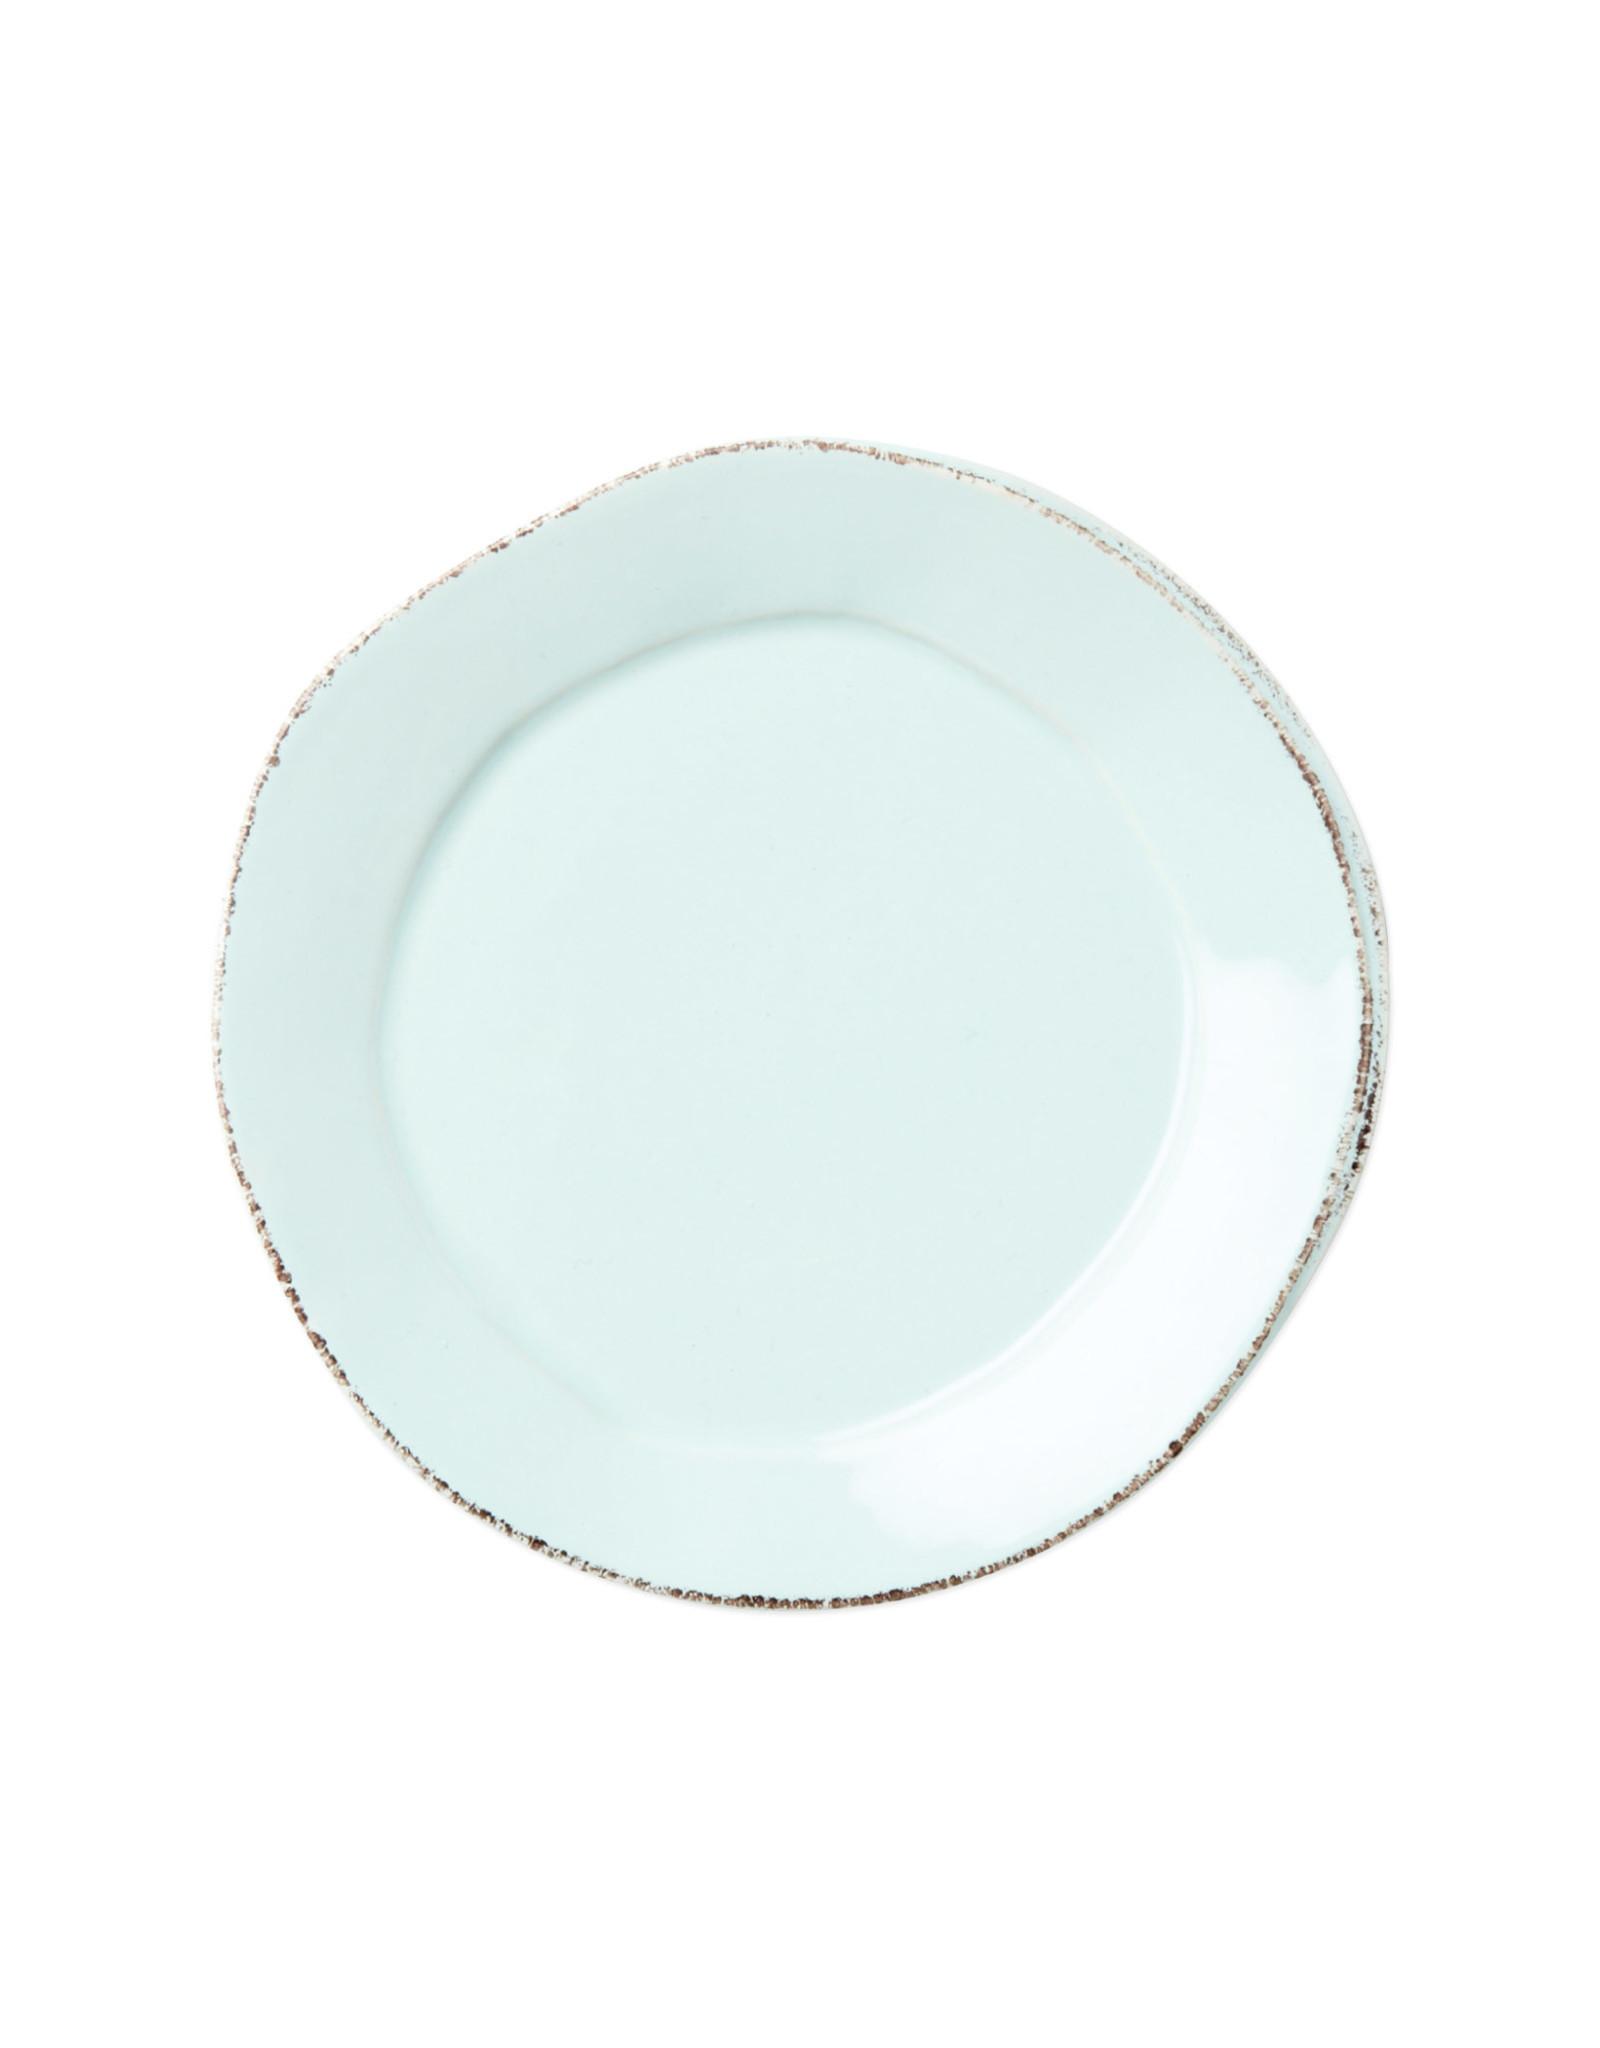 Vietri Lastra Canape Plate Aqua